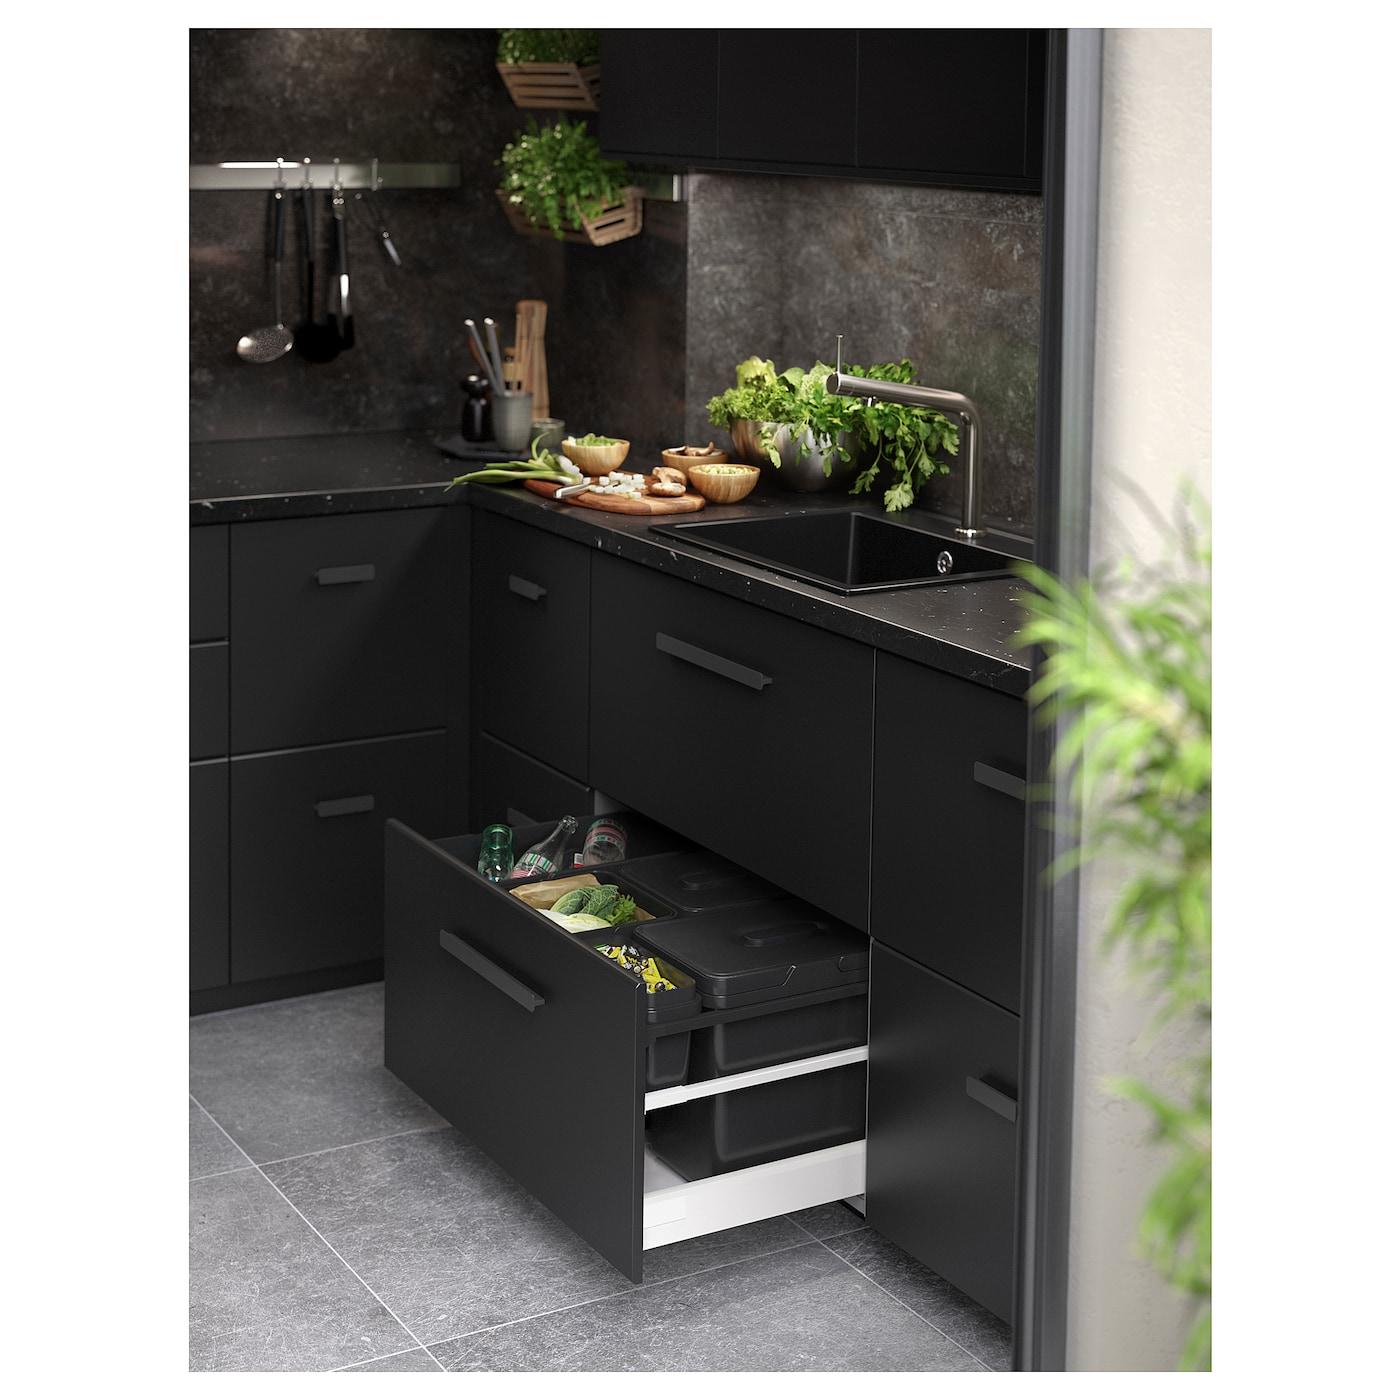 bosj n mitigeur couleur acier inox ikea. Black Bedroom Furniture Sets. Home Design Ideas